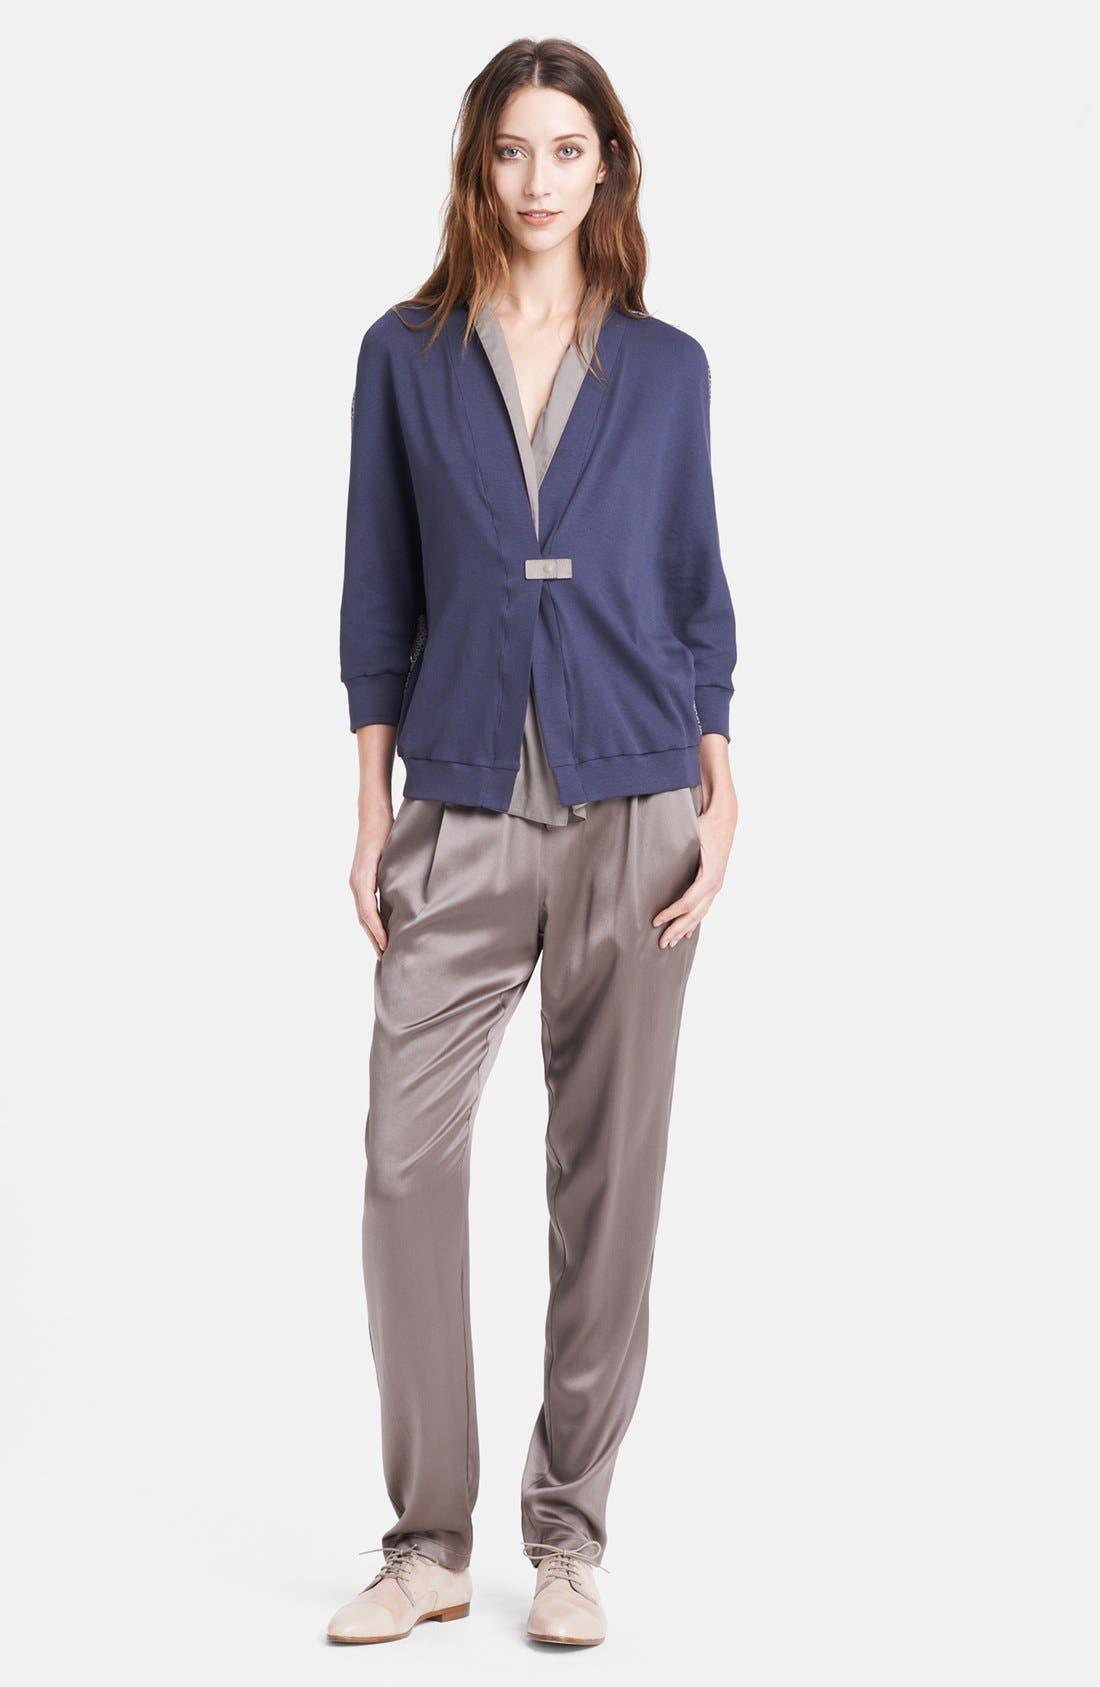 Alternate Image 1 Selected - Fabiana Filippi Cardigan & Pants